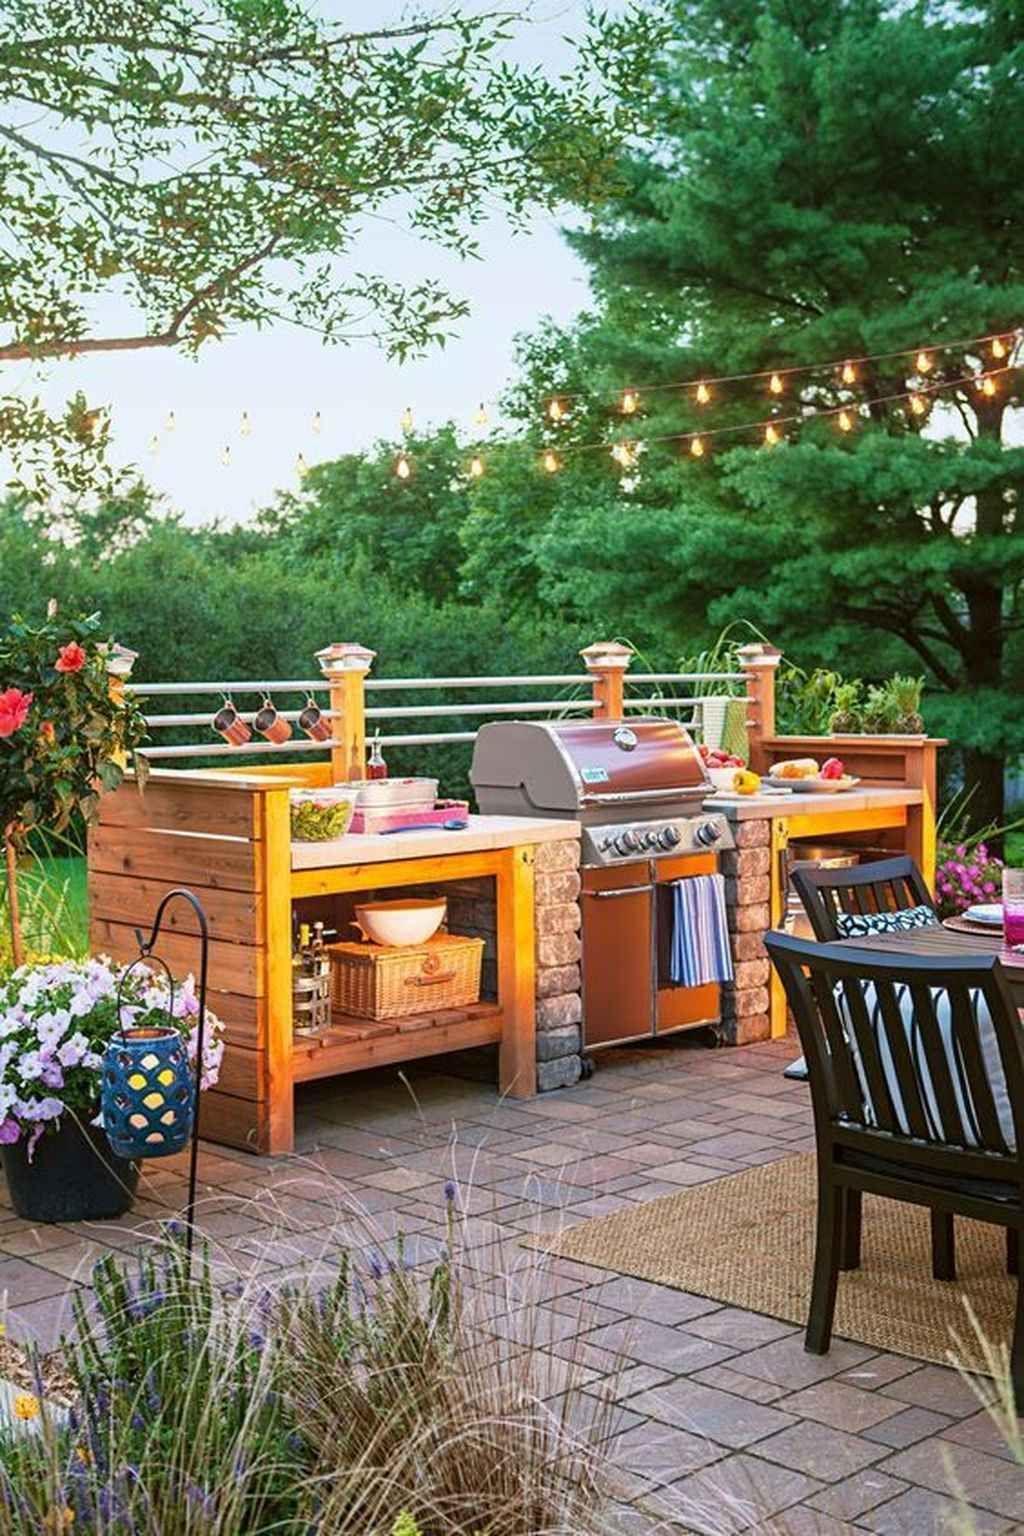 Stunning Outdoor Kitchen Design Ideas For Perfect Summer 11